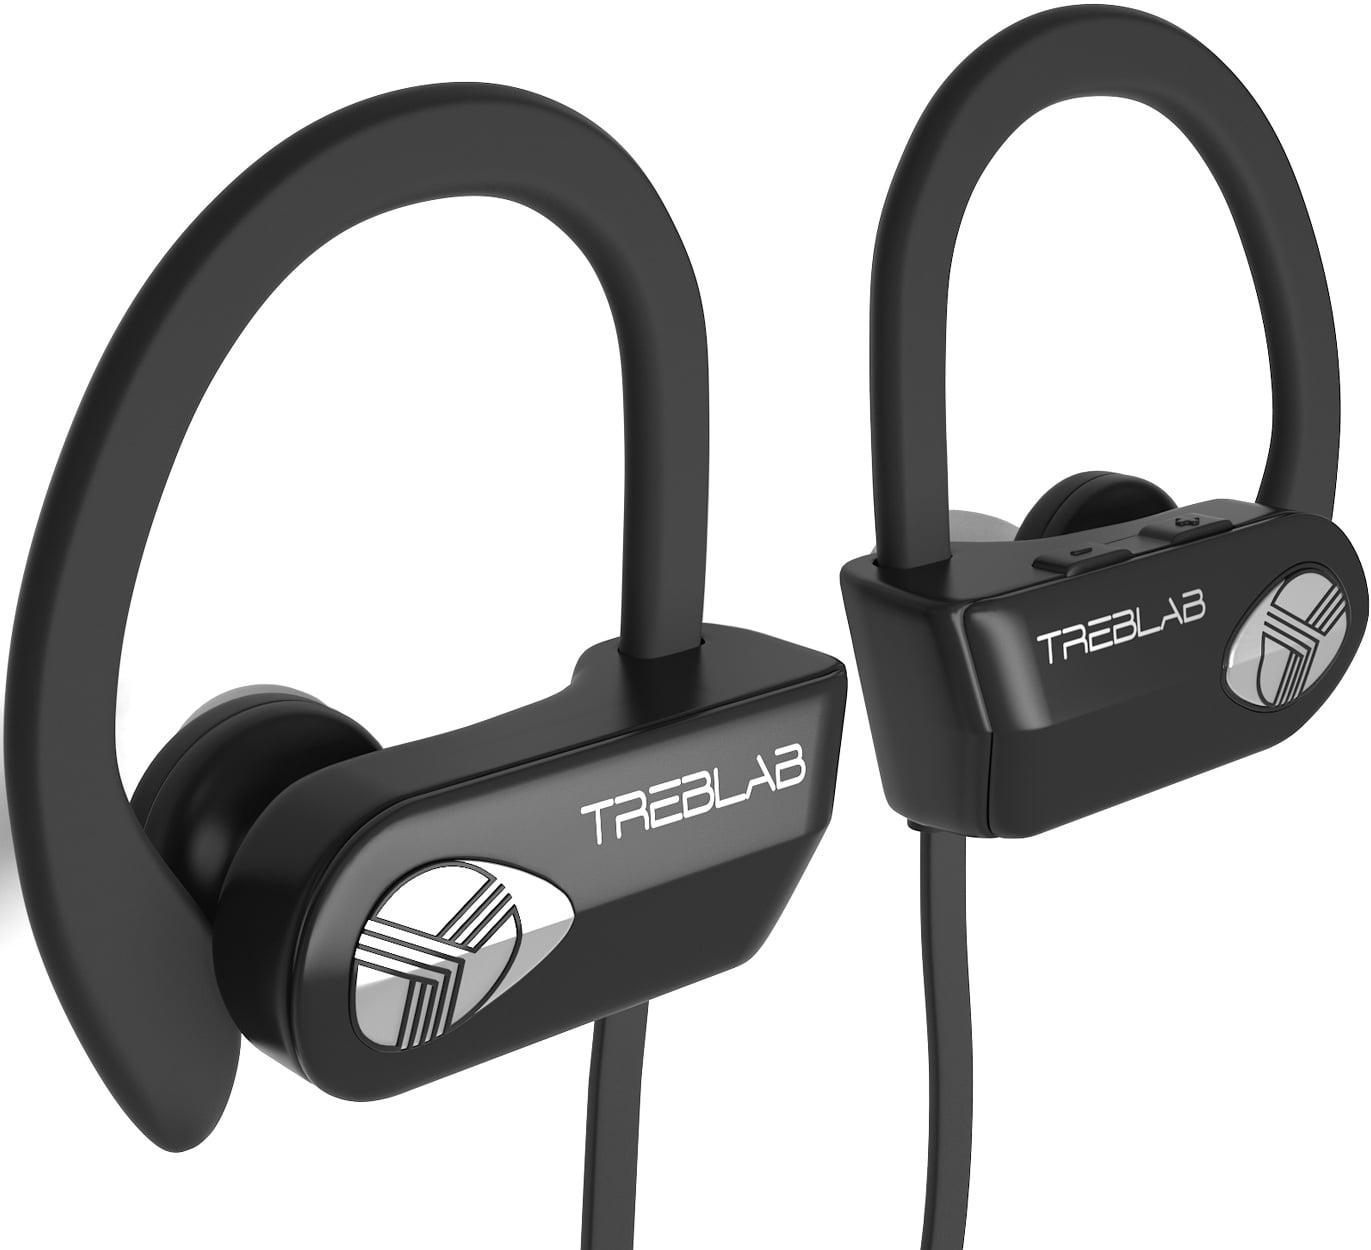 Exercise training wireless headphones - kids wireless headphones white